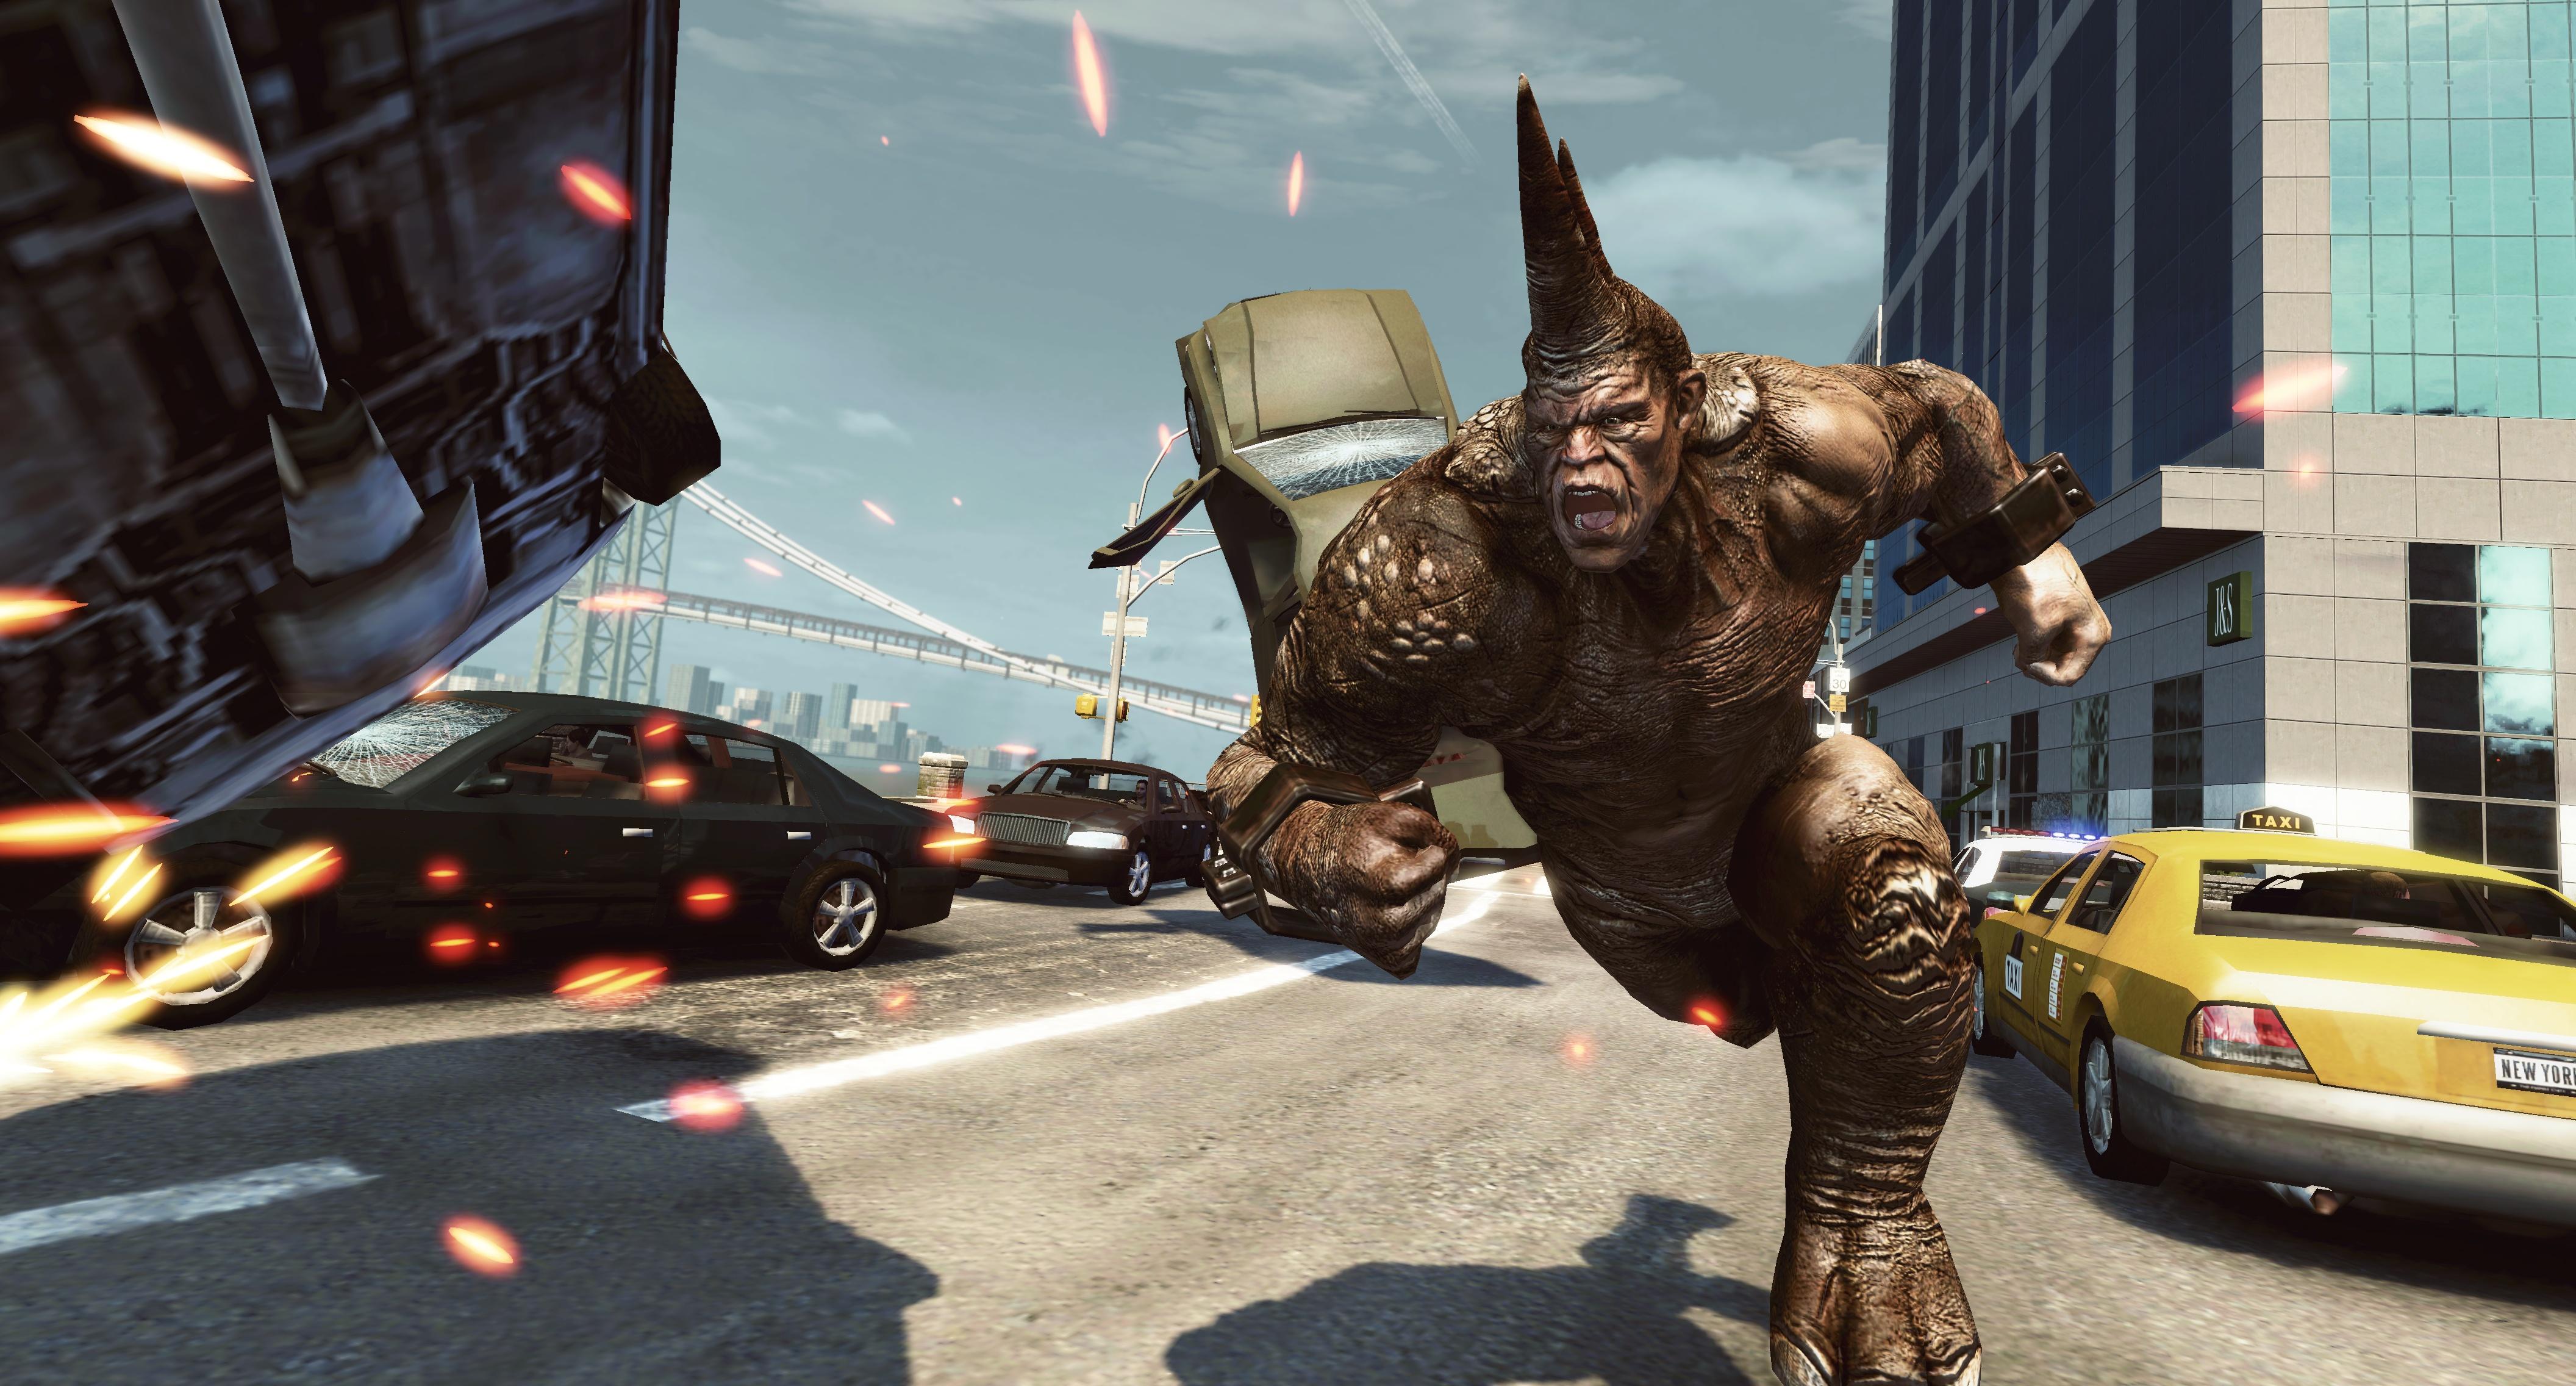 Rhino Video Game